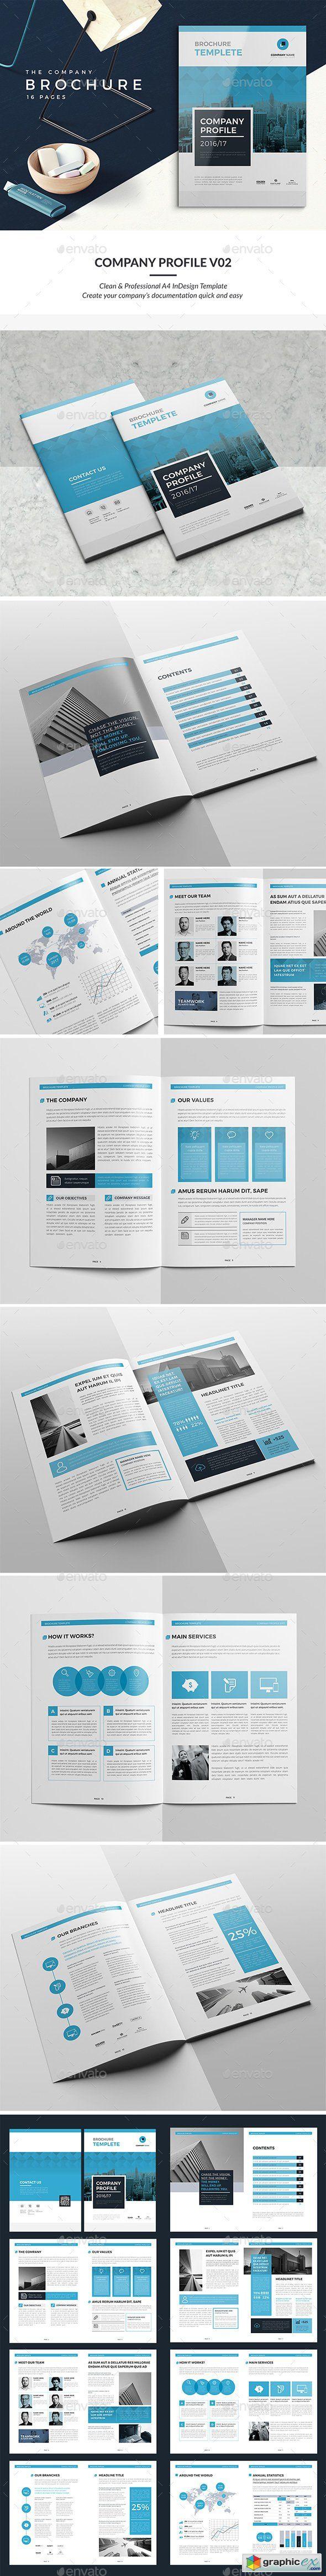 Company Profile V2 14 best Corporate Proposal